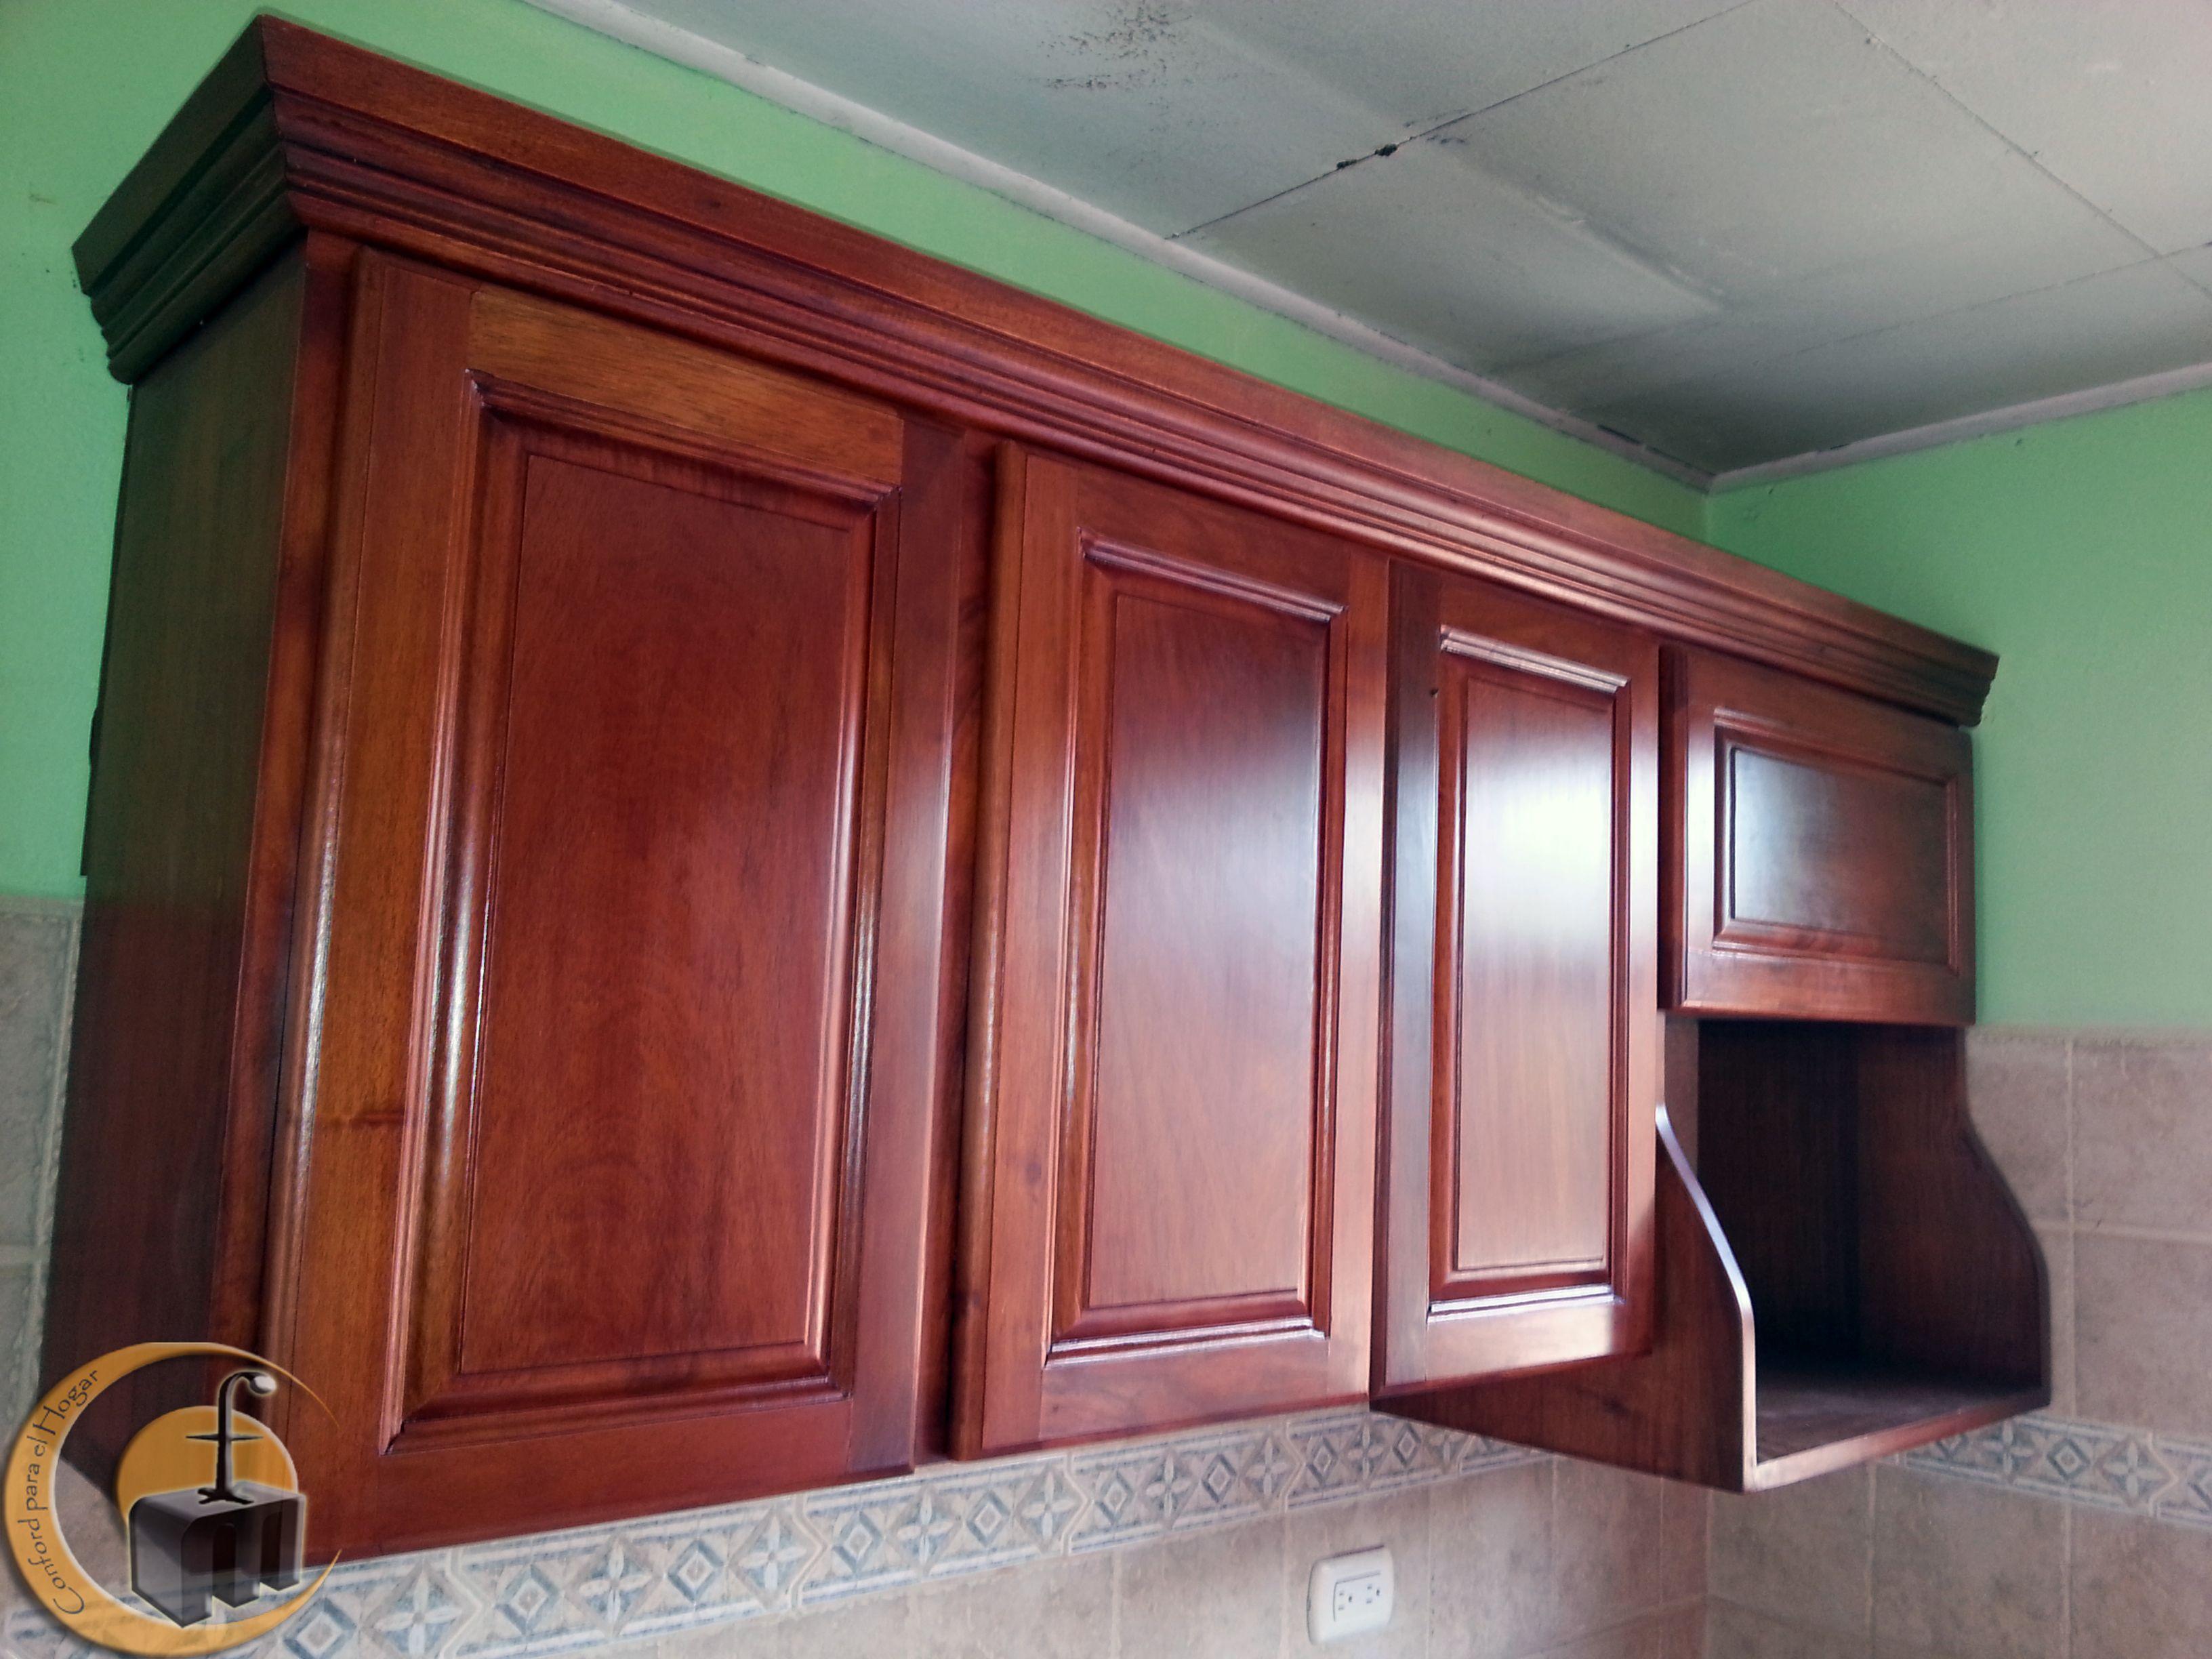 cocina de madera cedro m dulo a reo con mueble para On muebles aereos para cocina